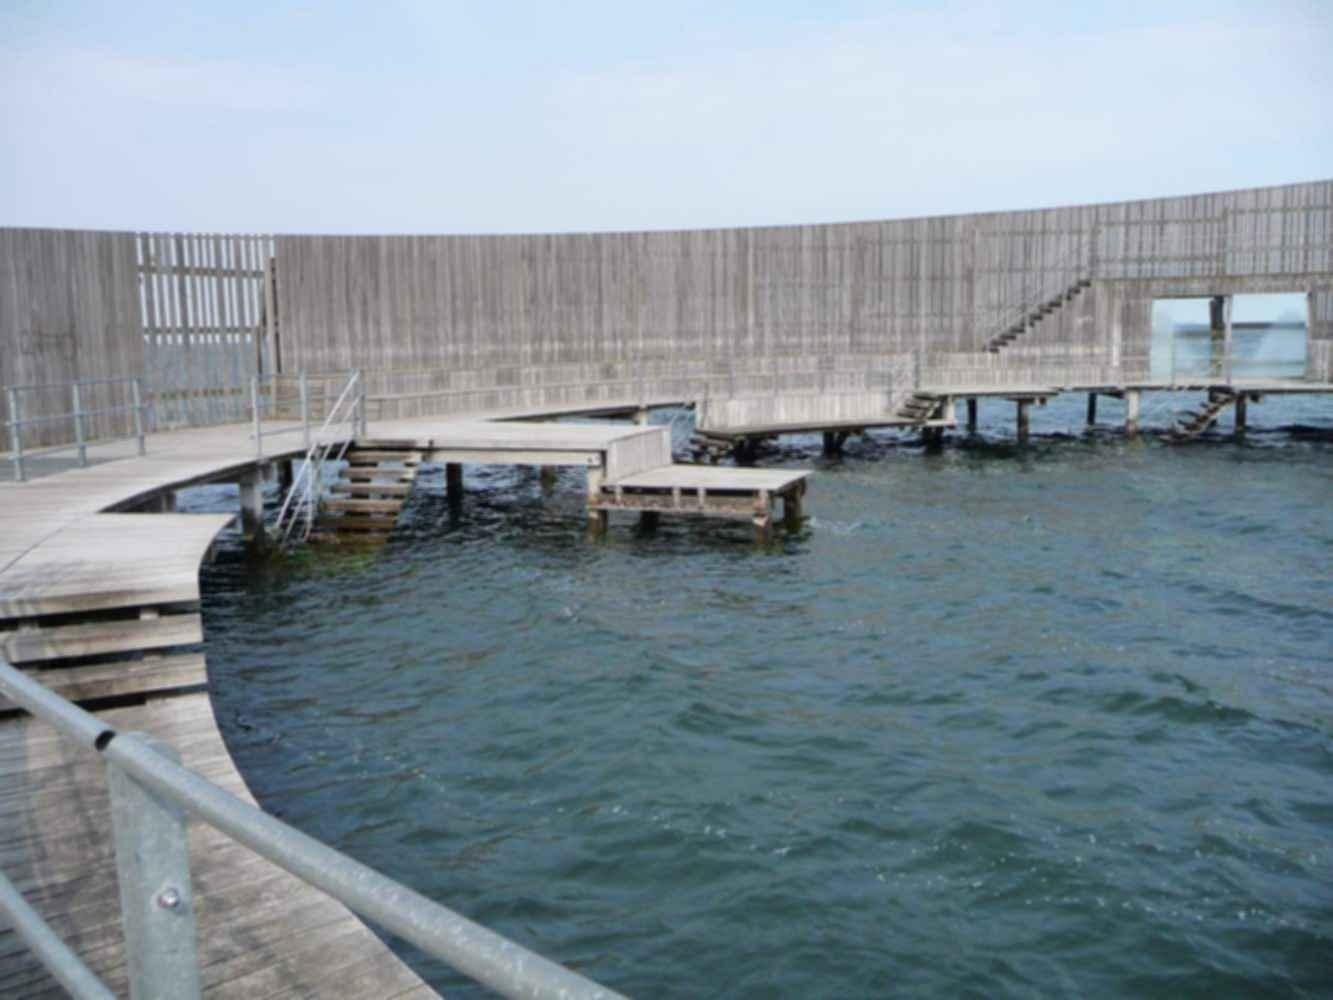 The Kastrup Sea Bath - Jumping Ledges